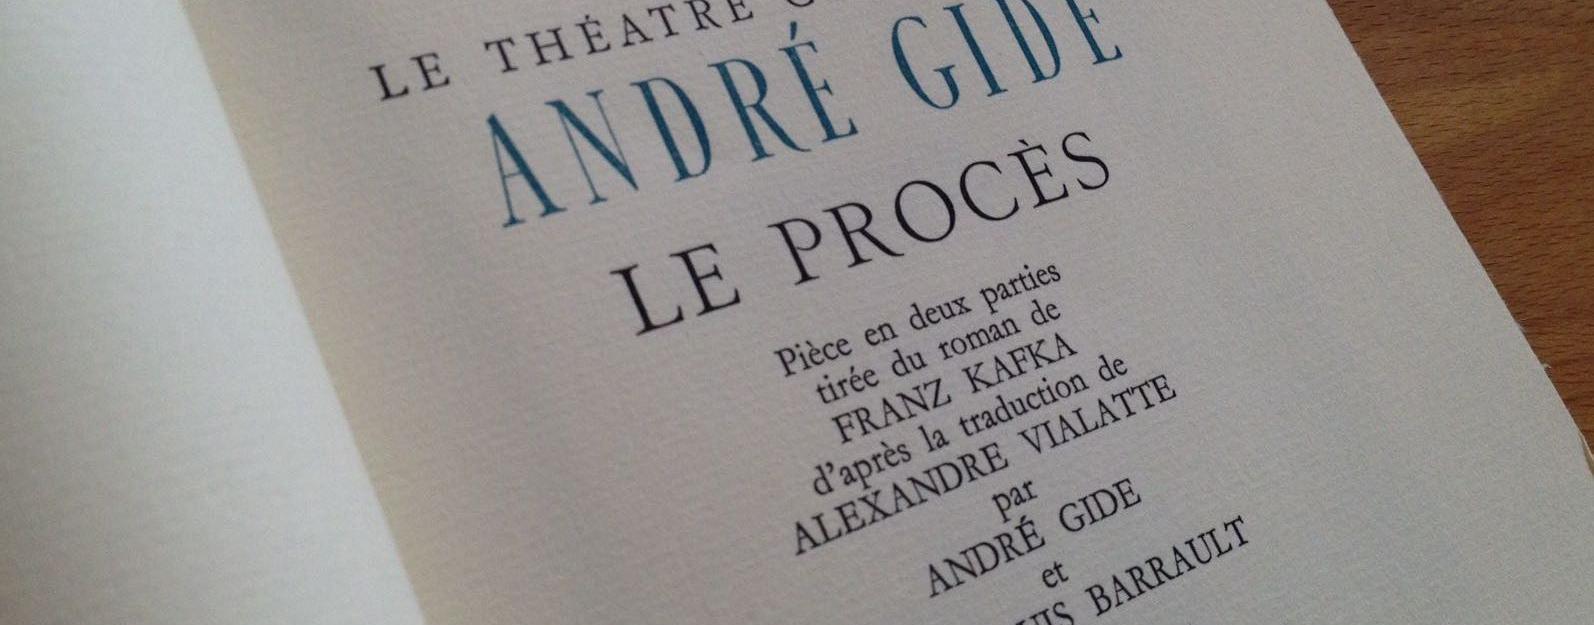 colloque gide theatre